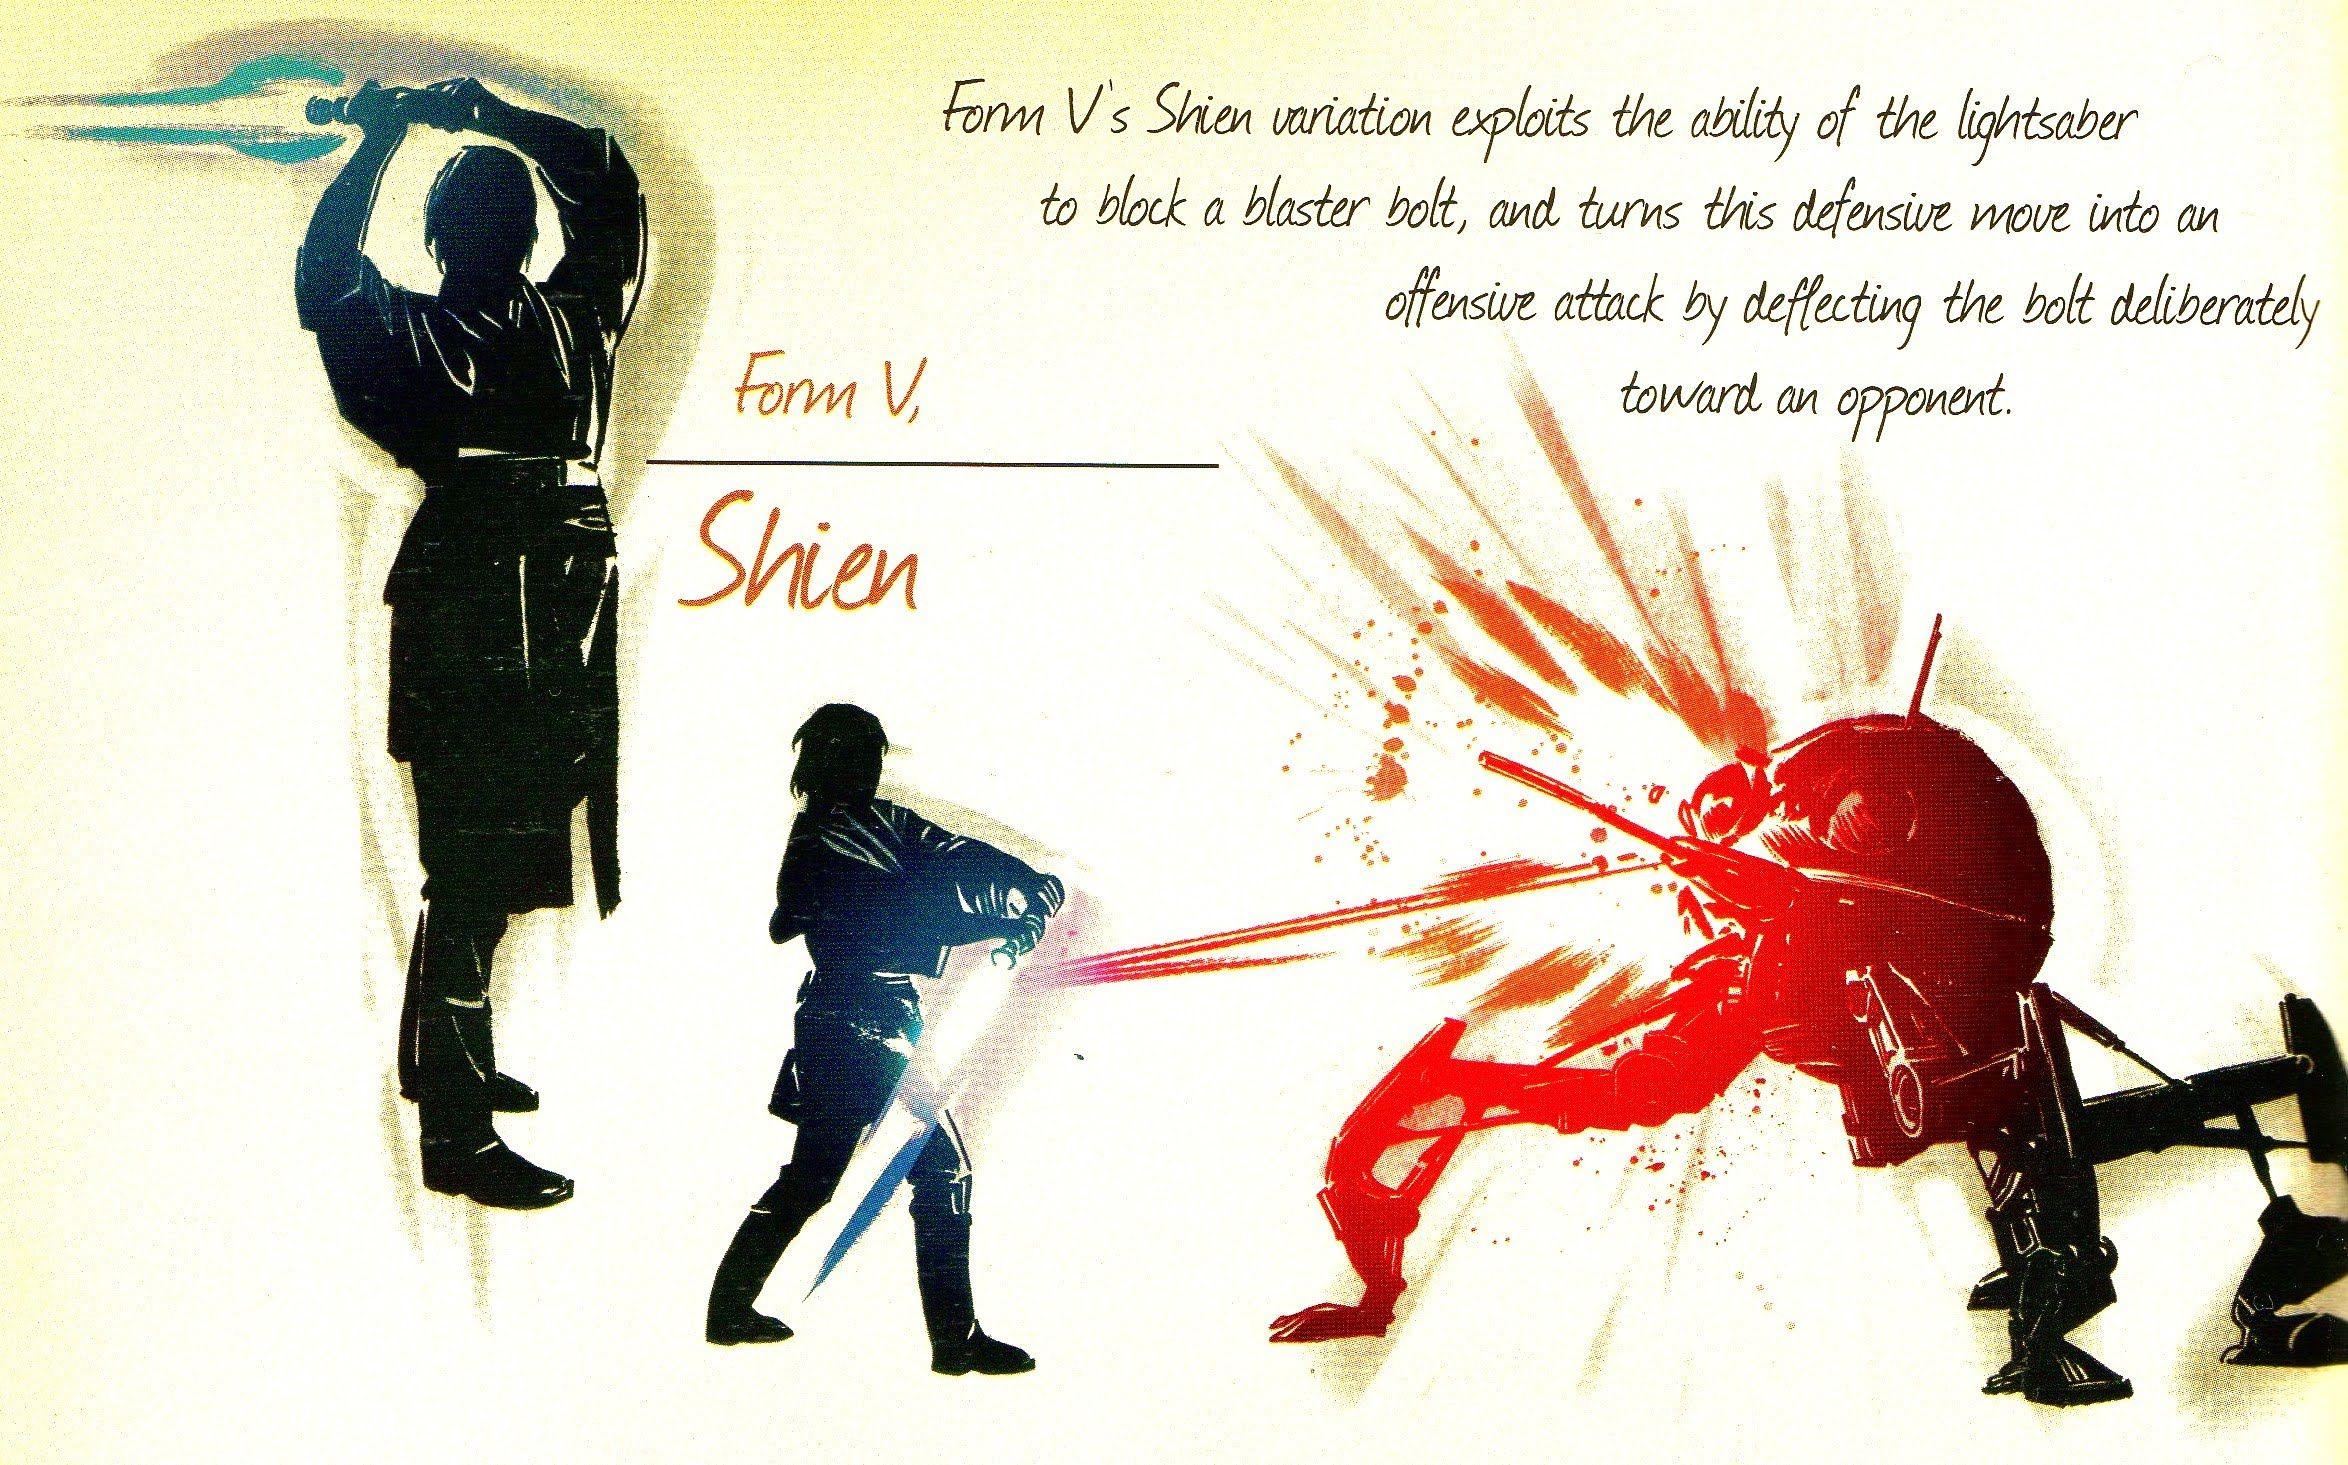 Form V: Shien - Description & Analysis   Star wars painting, Star wars  light saber, Star wars fan art